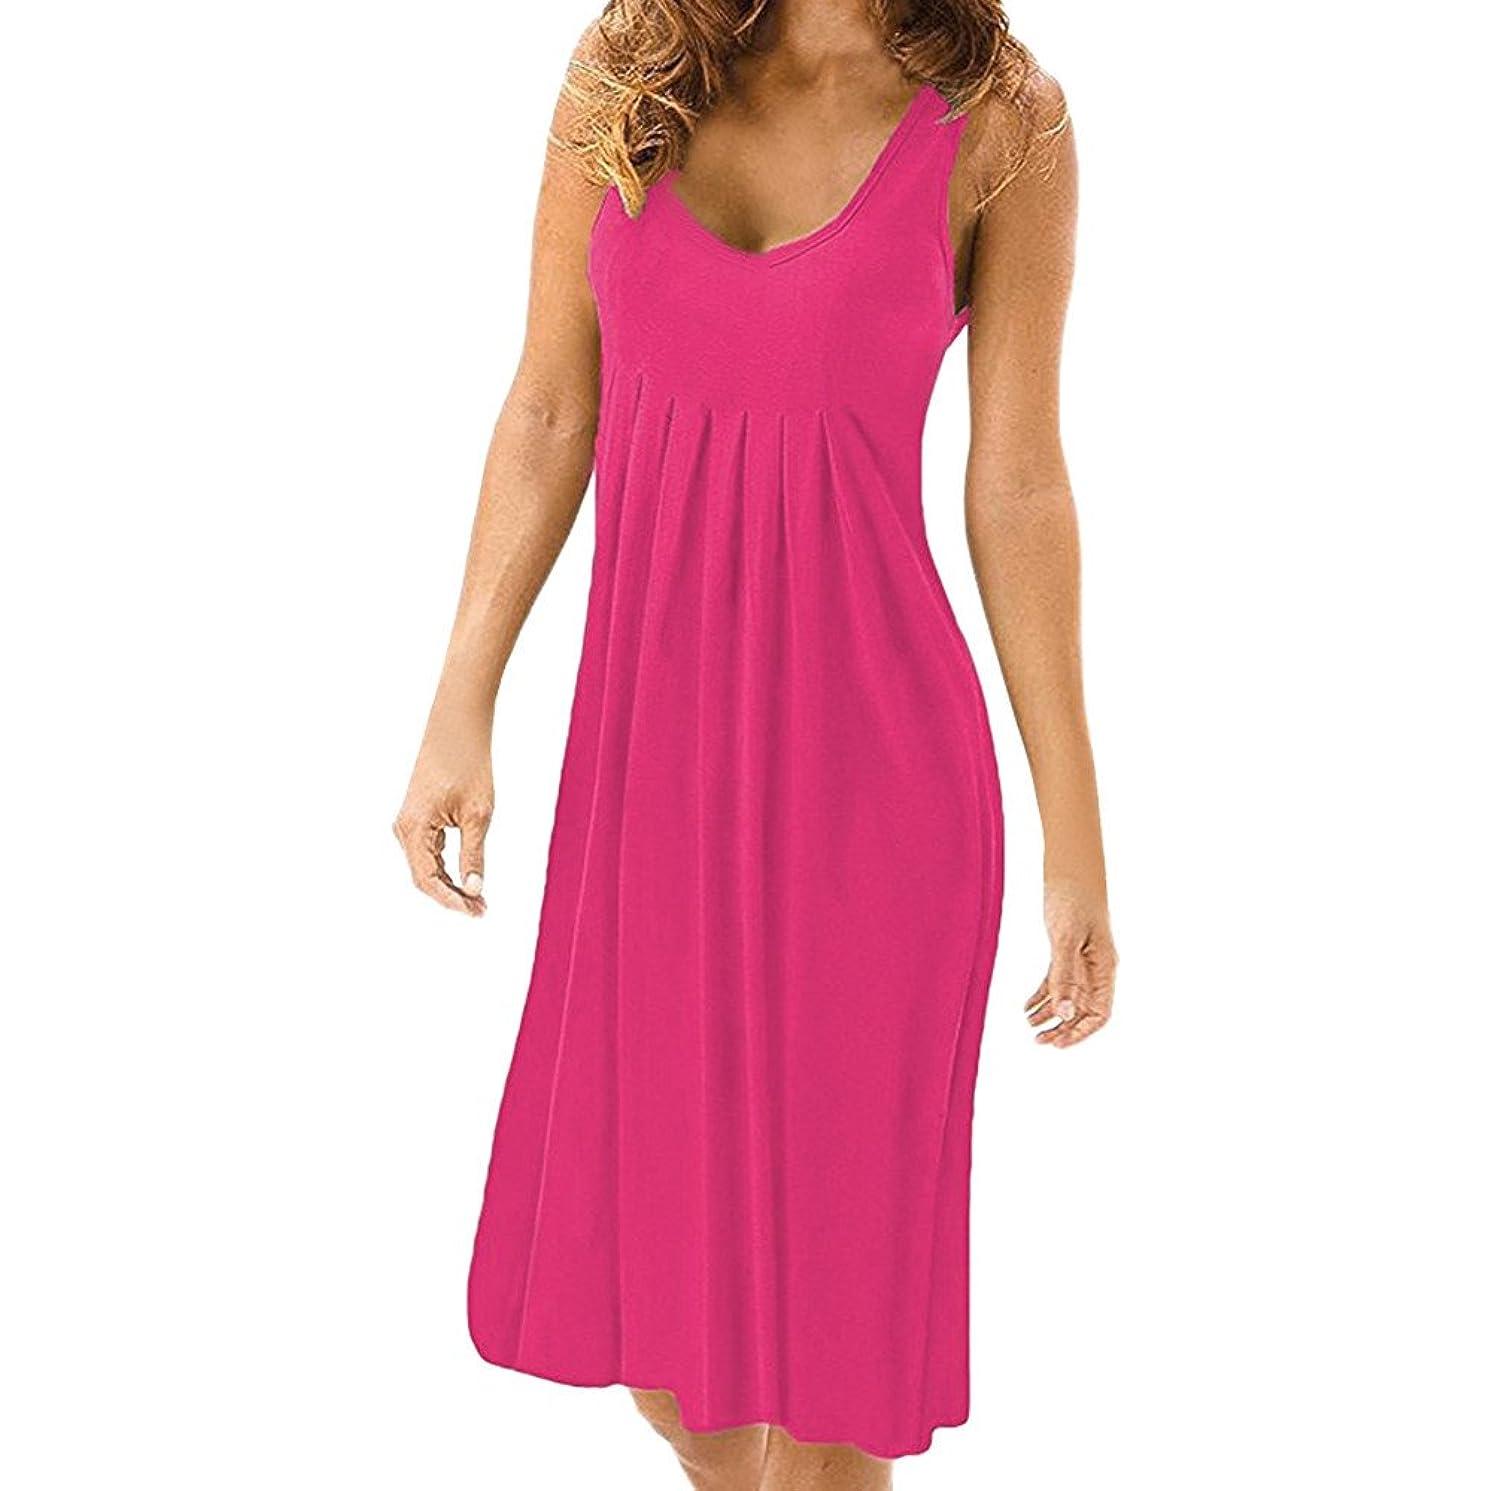 Auimank HOT!2019d Women Summer Sexy Solid Sleeveless Plain Pleated Casual Mini Dress